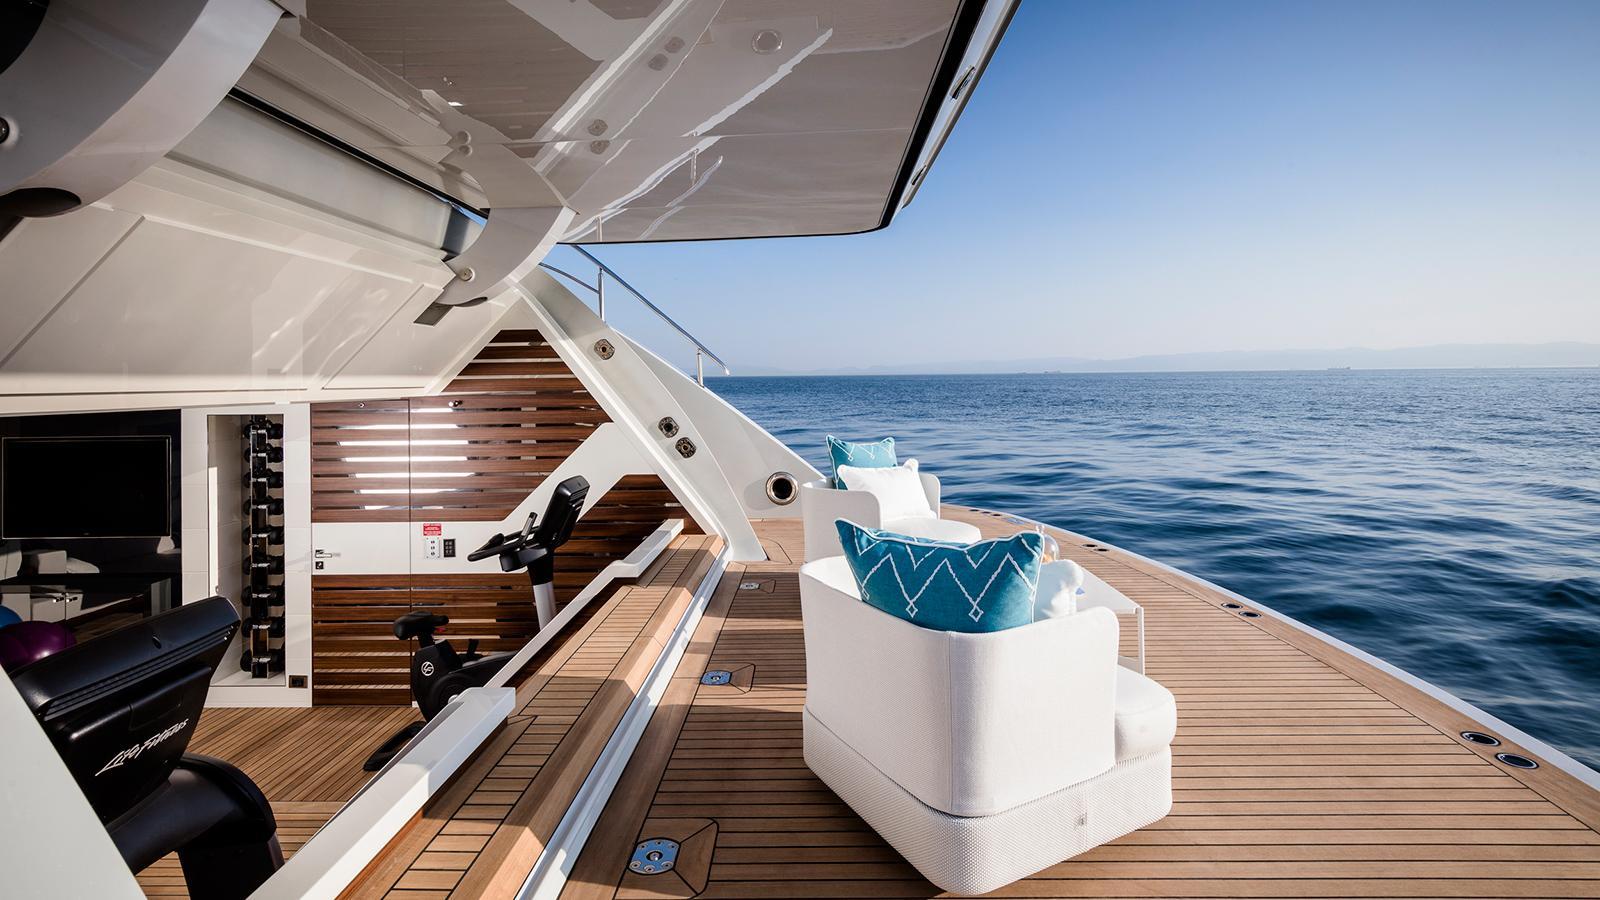 roe razan motoryacht turquoise yachts 2017 47m beach club